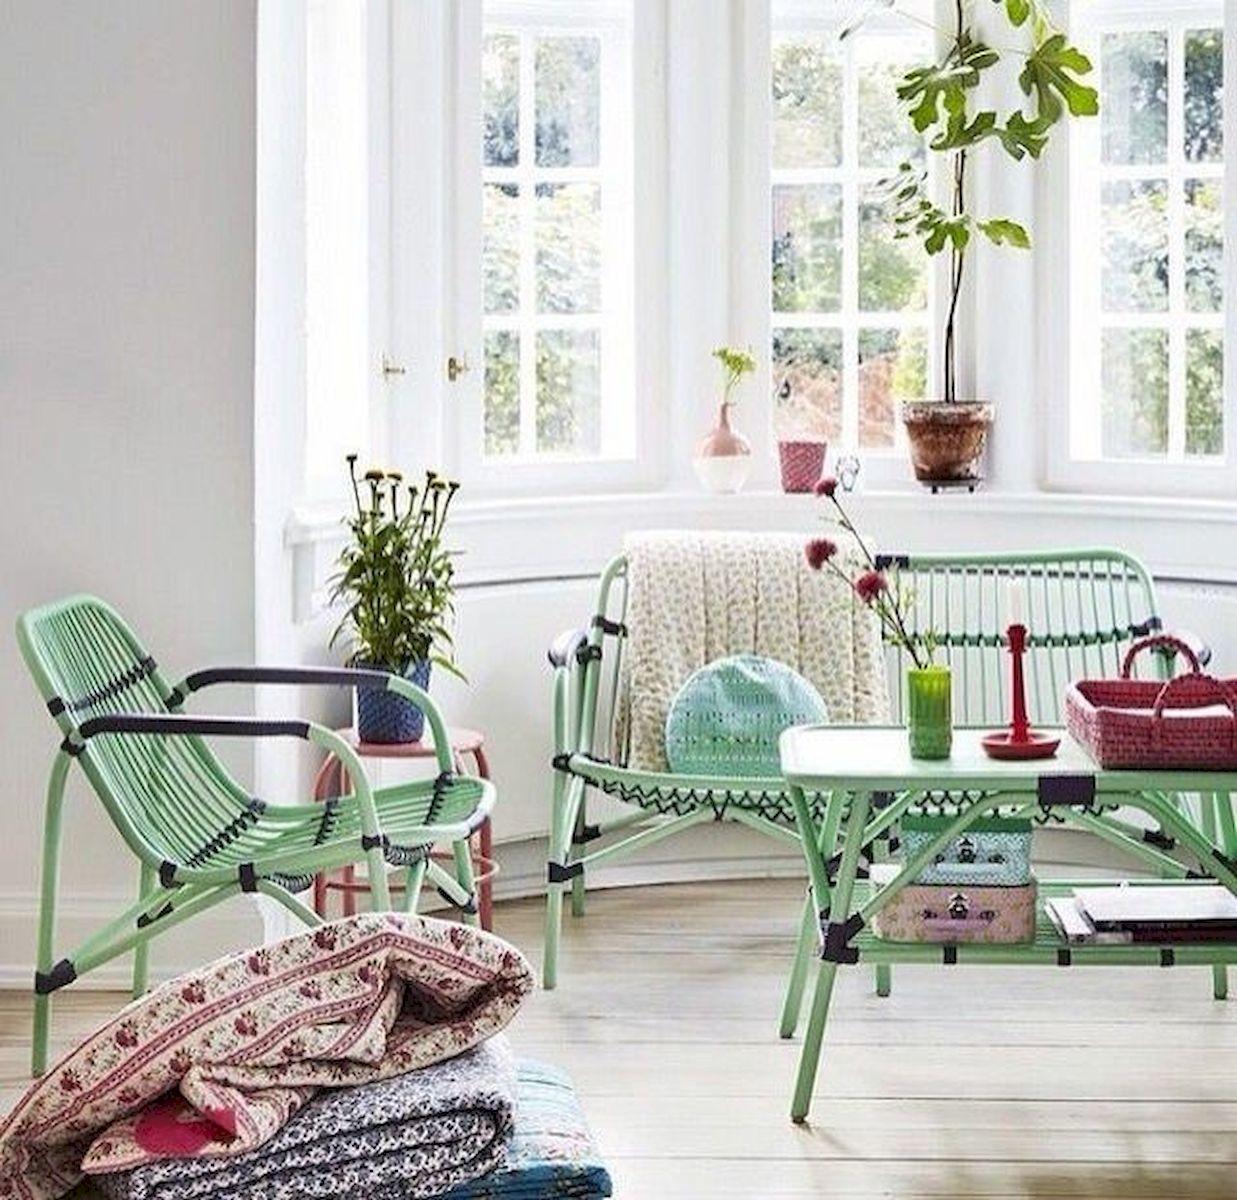 45 Colorful Interior Home Design and Decor Ideas (7)